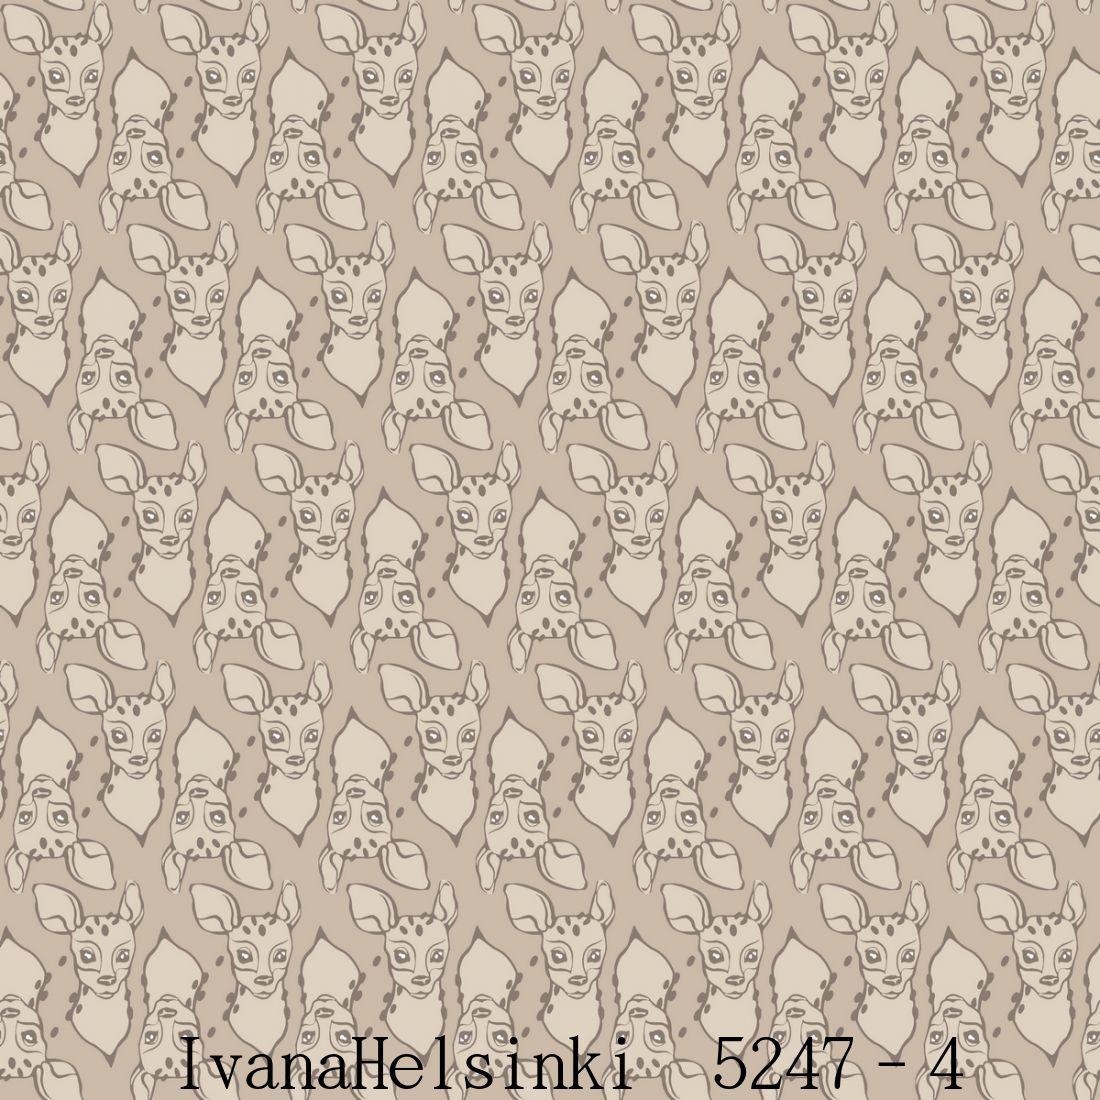 IvanaHelsinki イヴァナヘルシンキフィンランド製 壁紙5247-4【 53cm幅×10m巻 】裏面:フリース素材鹿 小鹿 バンビ アニマル 北欧 自然 ベージュ輸入壁紙IvanaHelsinki Wallpaper★P10倍★